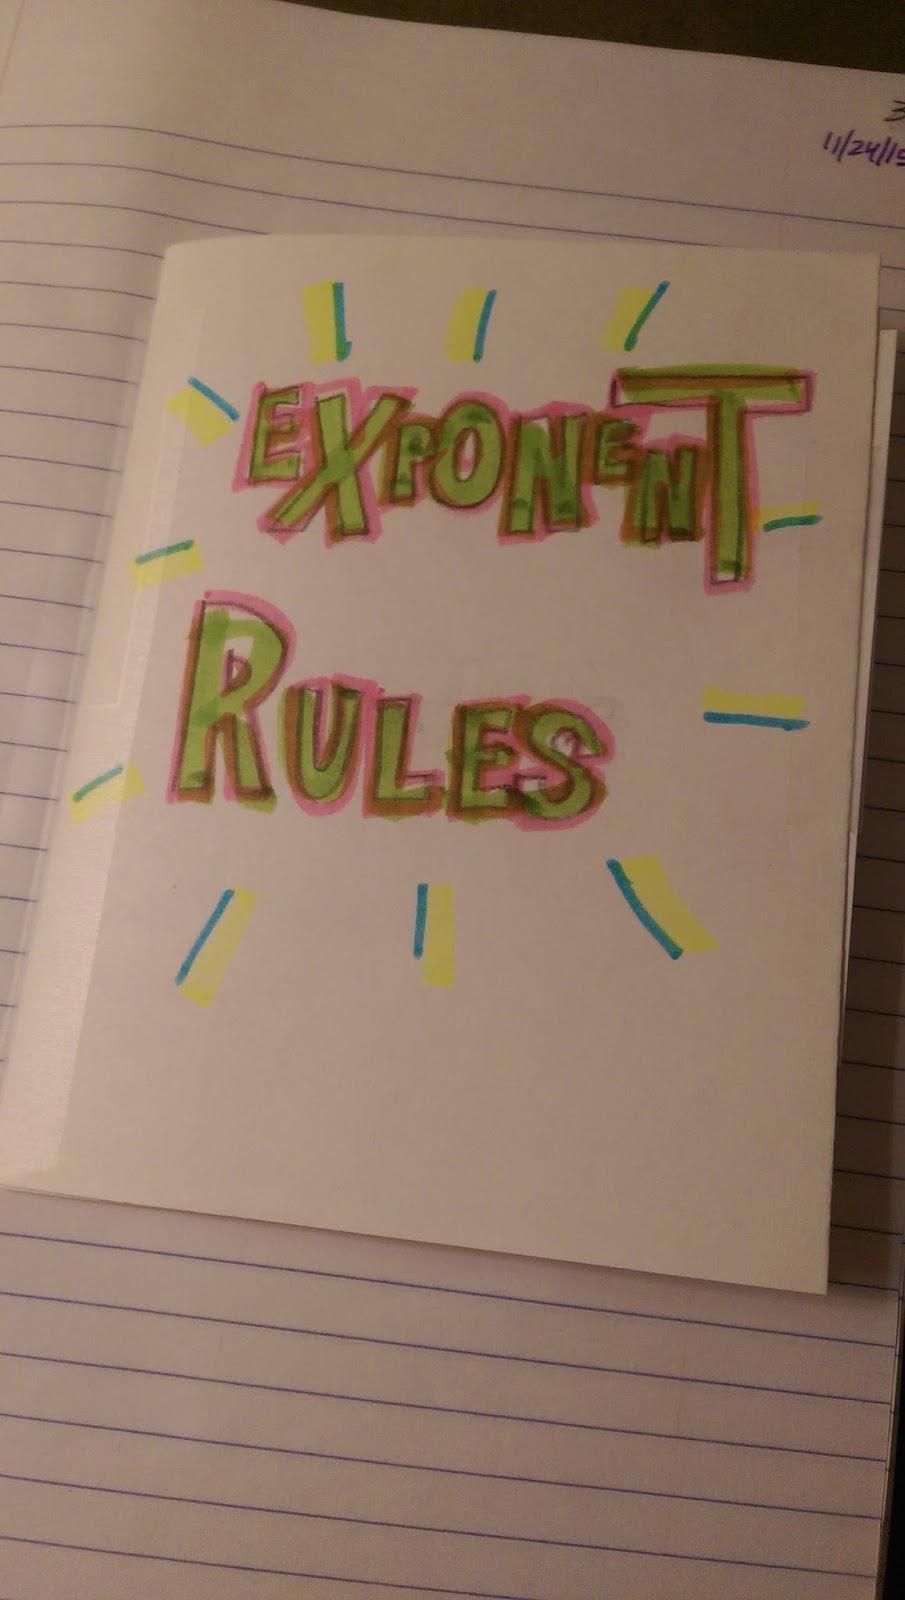 exponent rules flip book michaelis math rh michaelismath blogspot com Dividing Exponents Laws of Exponents Rules